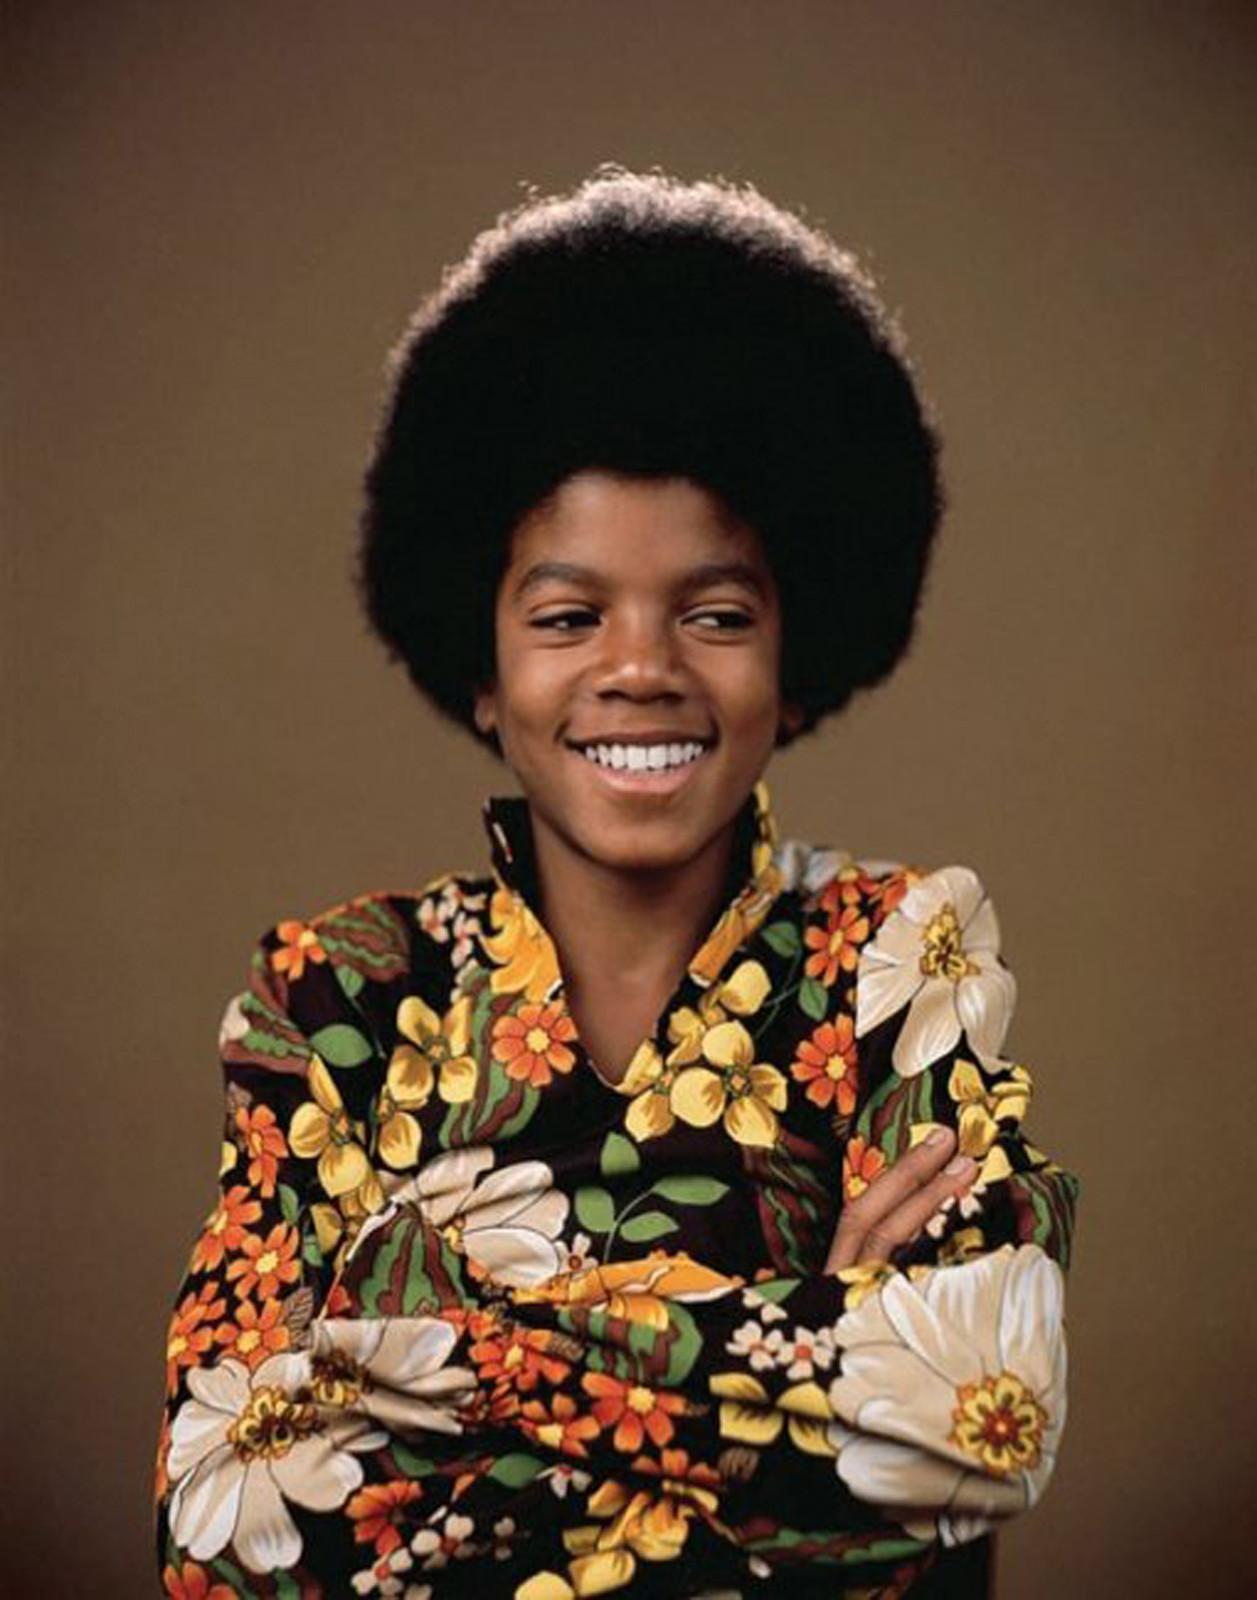 Young-Michael-michael-jackson-35768227-1257-1600